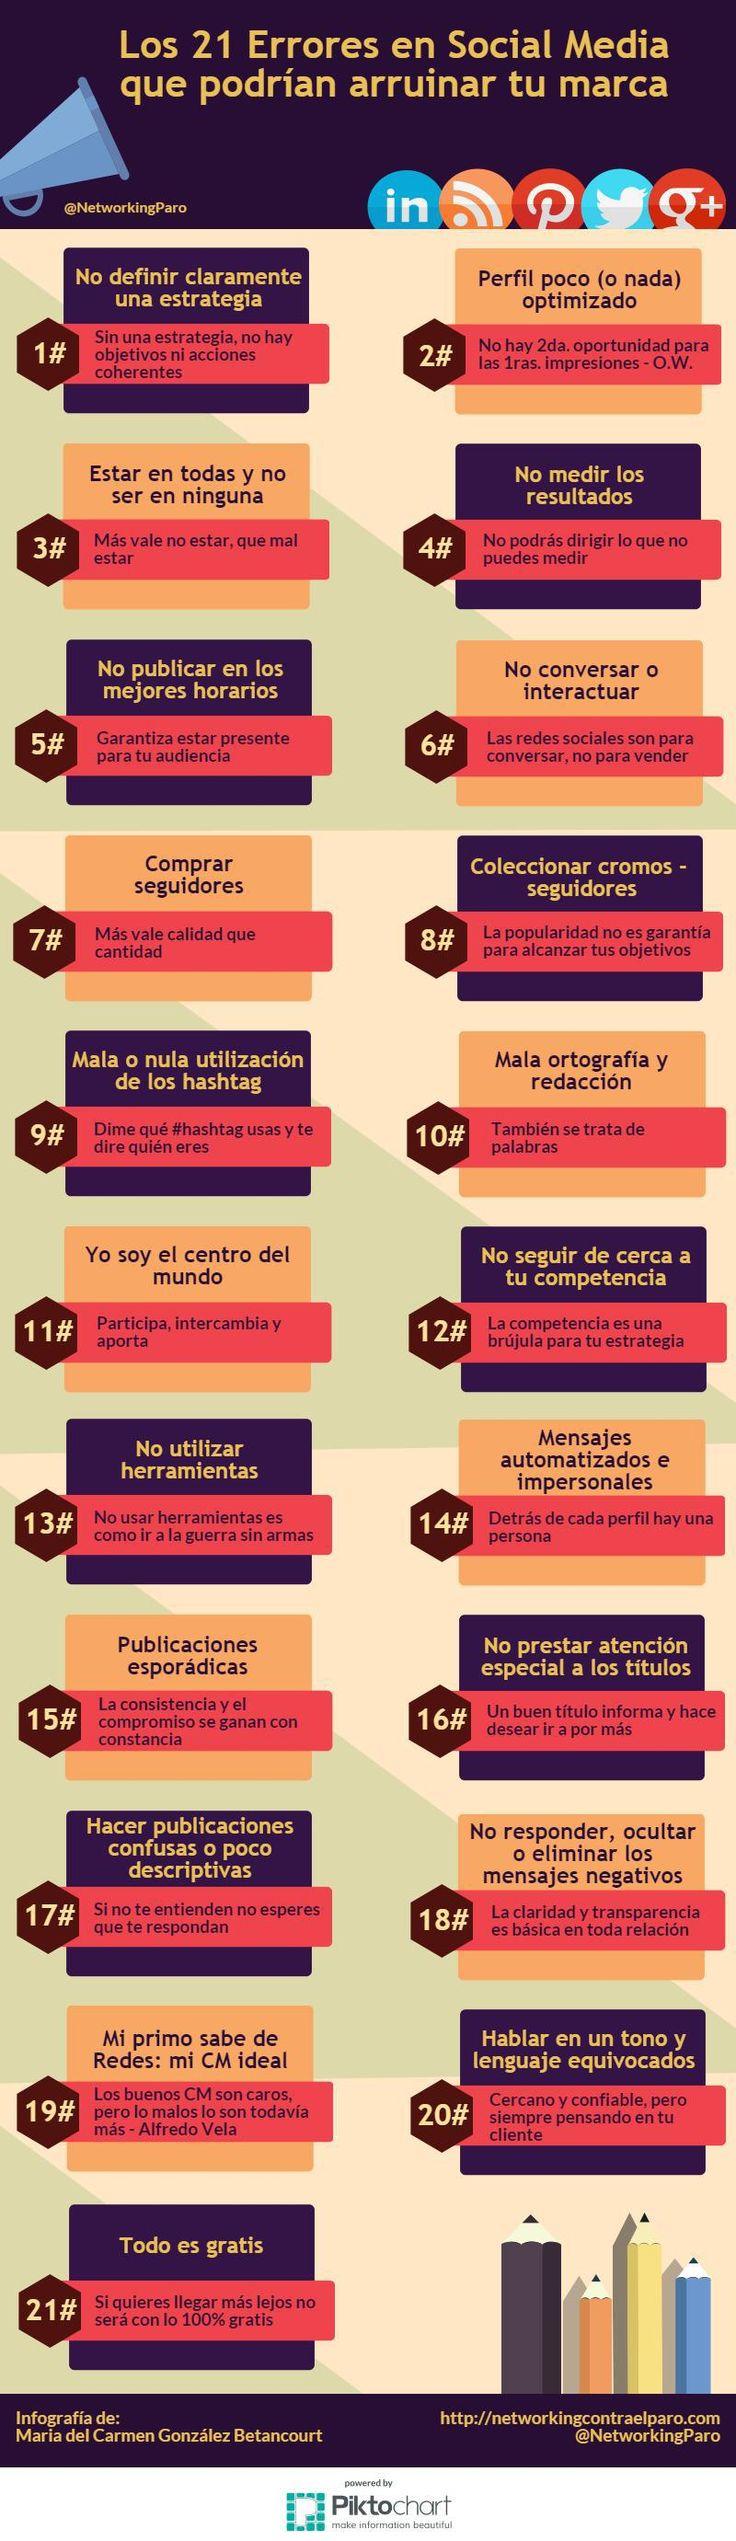 21 errores en Redes Sociales peligrosos para tu Marca #infografia #marketing…